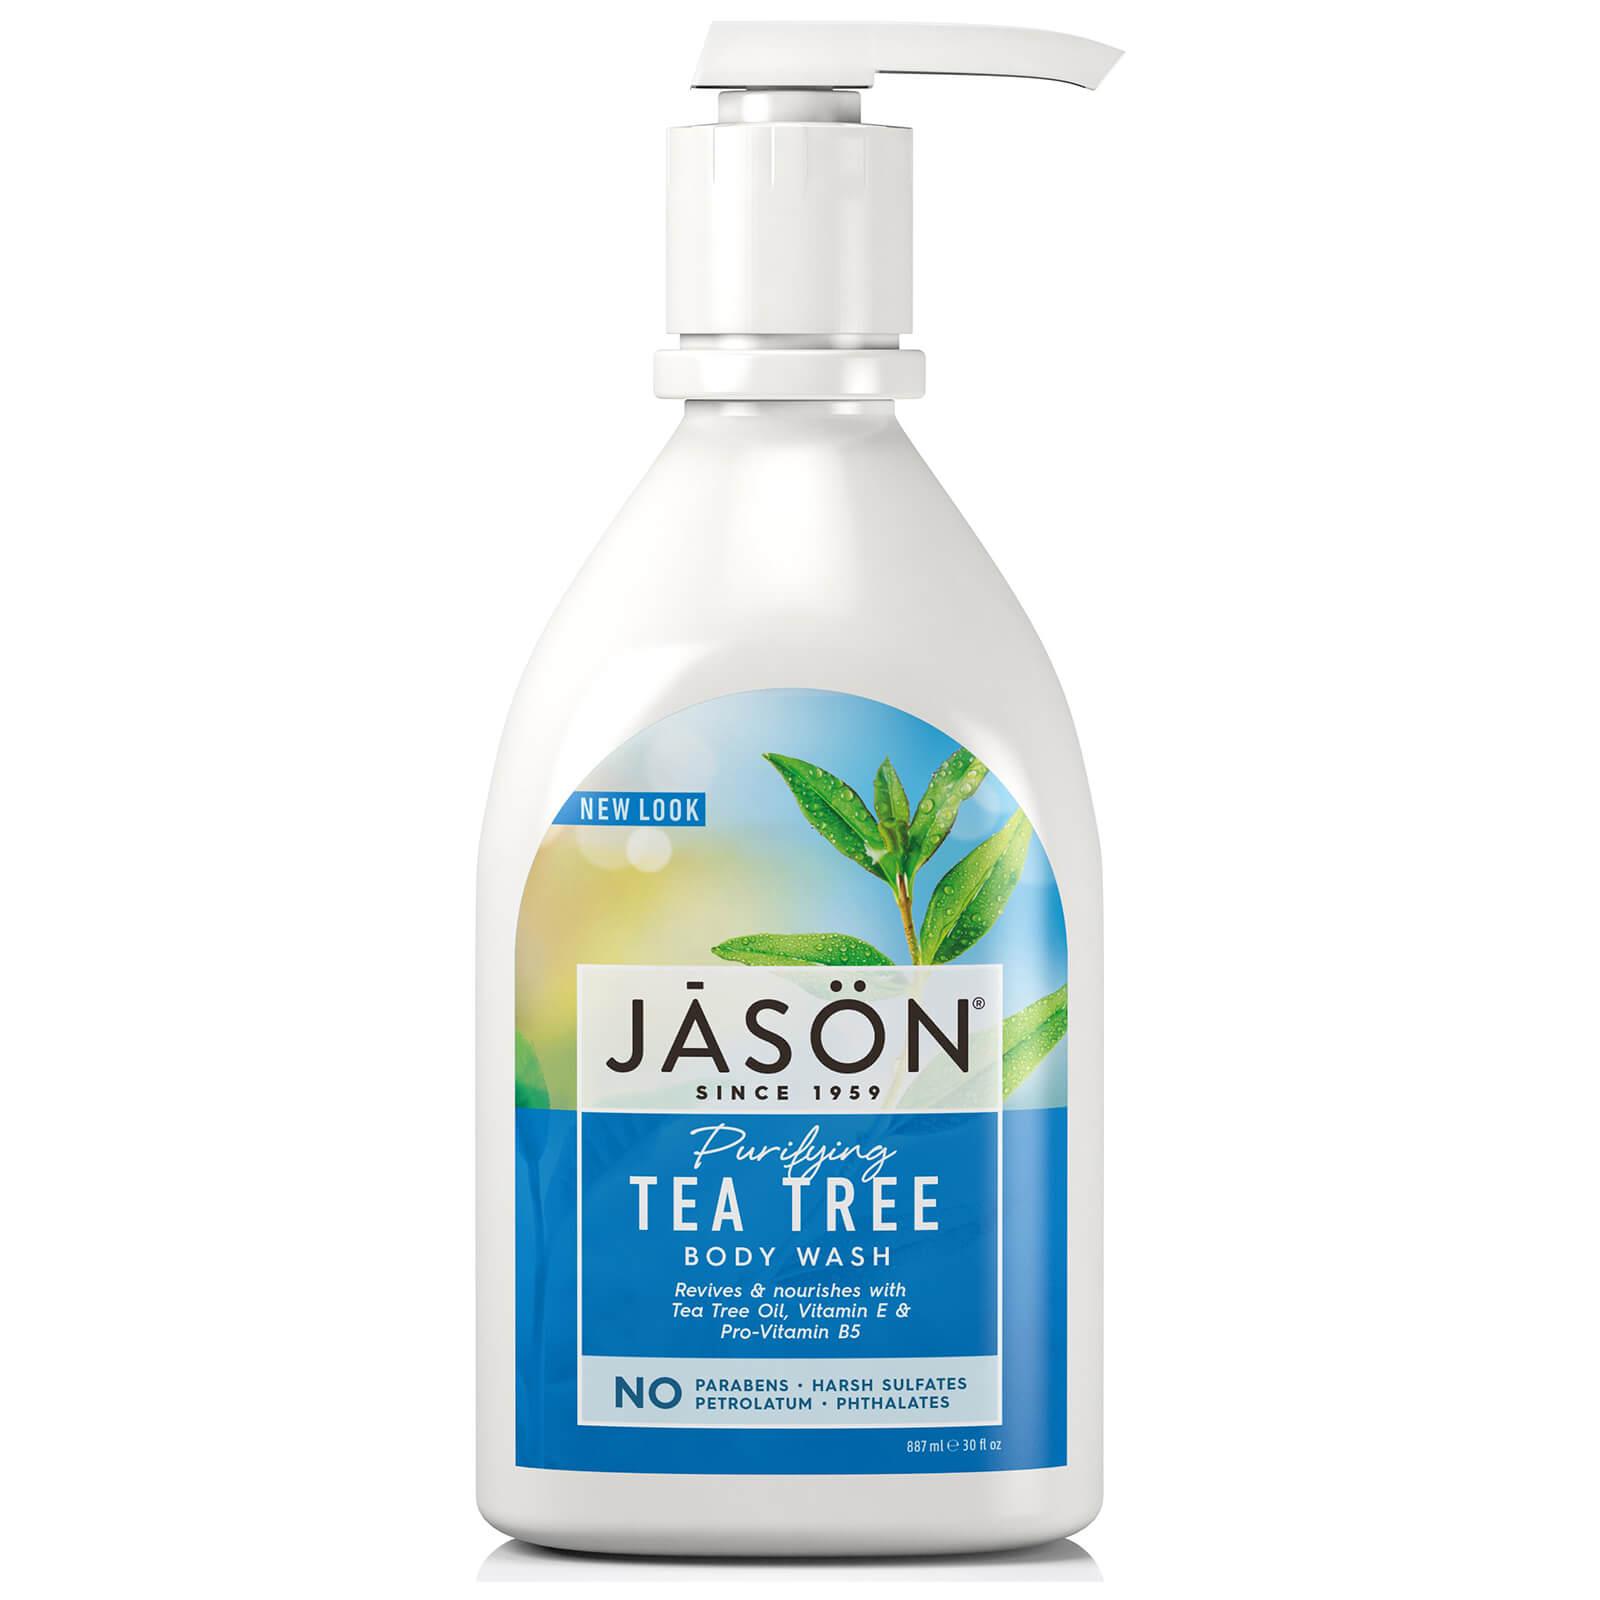 JASON Purifying Tea Tree Body Wash (900ml)